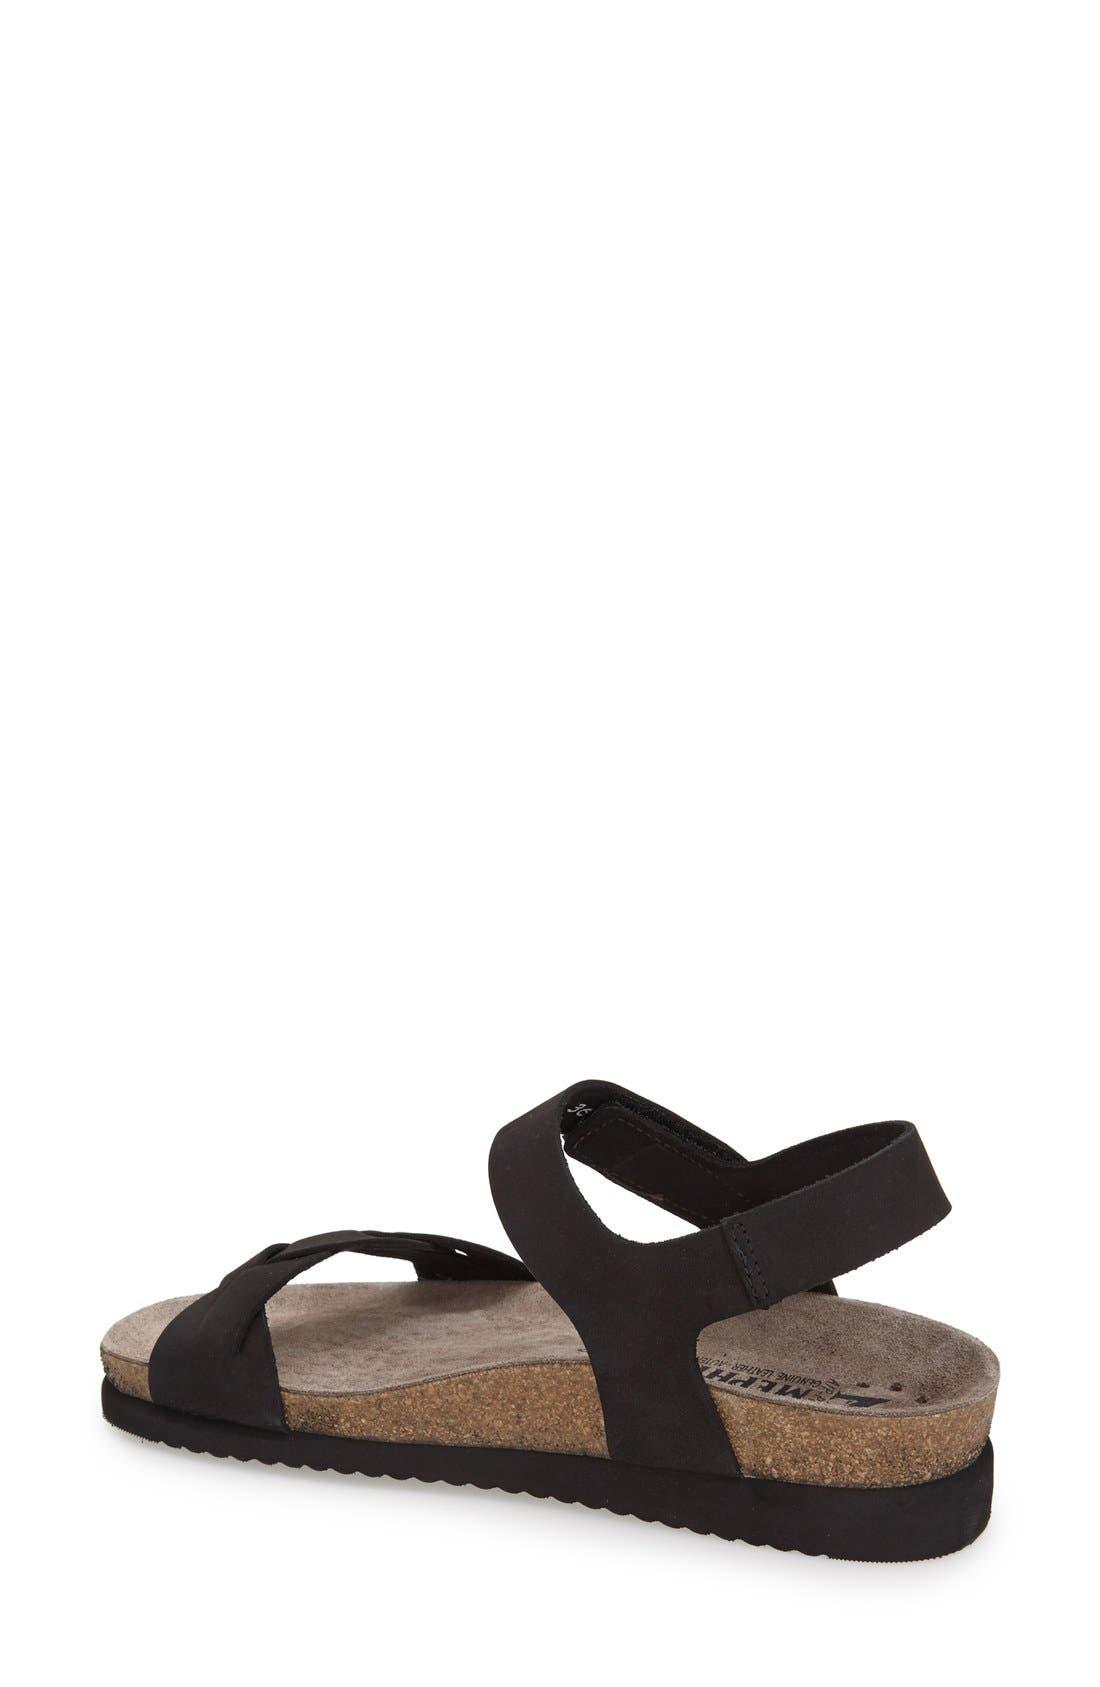 Alternate Image 2  - Mephisto 'Honoria' Nubuck Leather Sandal (Women)